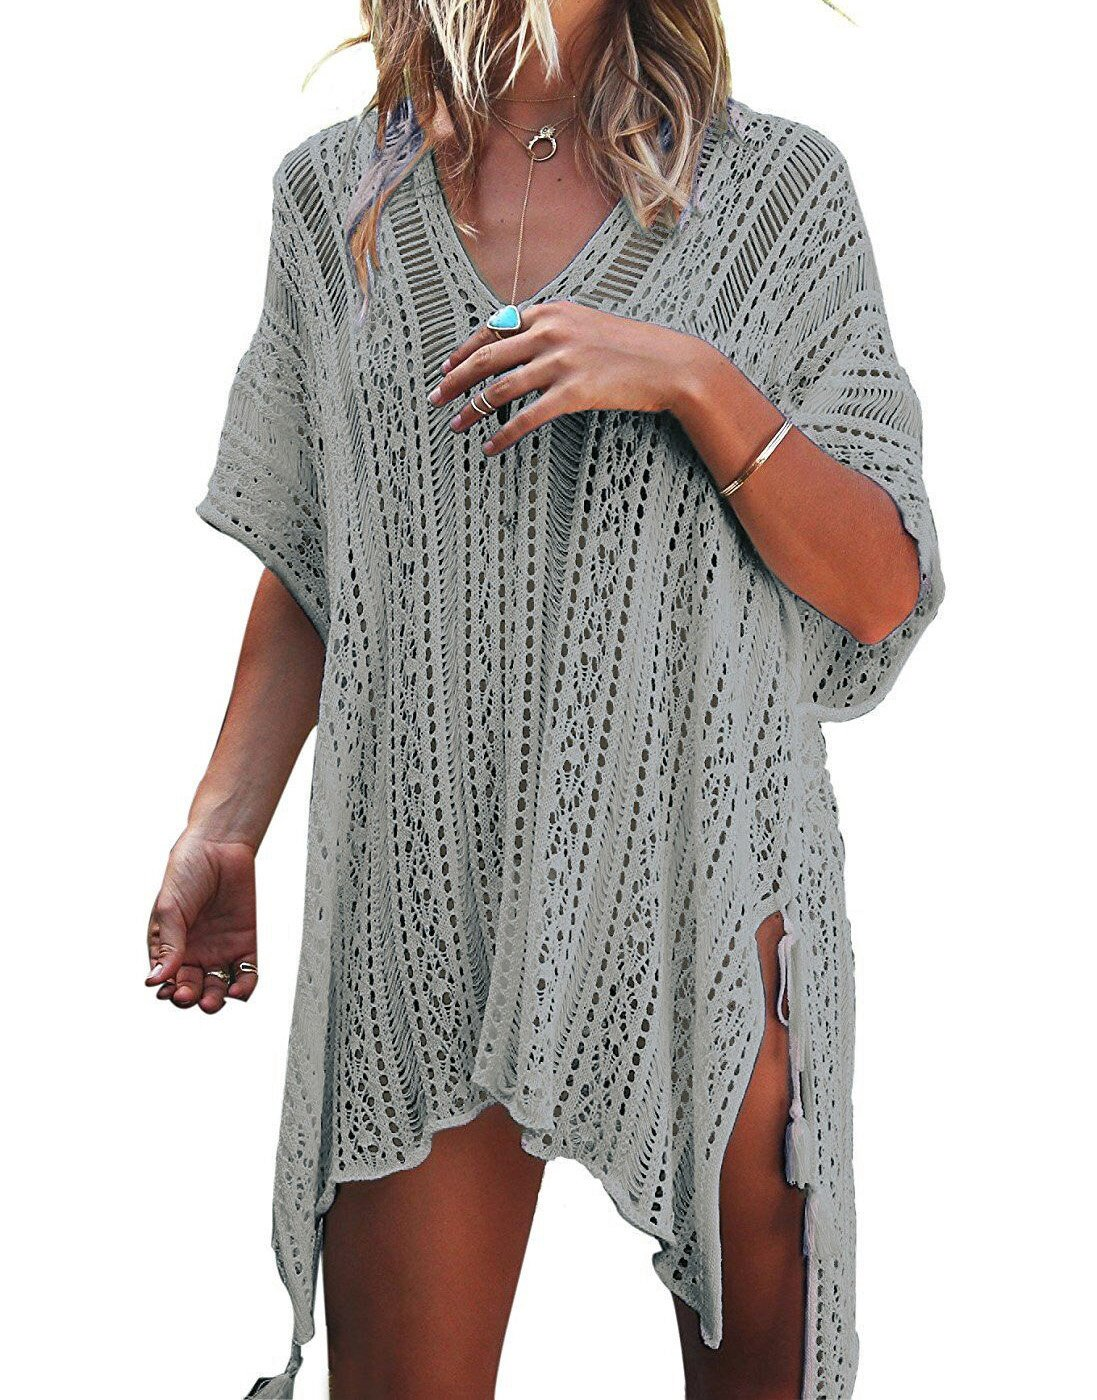 LAVENCHY Women Summer Swimsuit Bikini Beach Swimwear Crochet Cover up